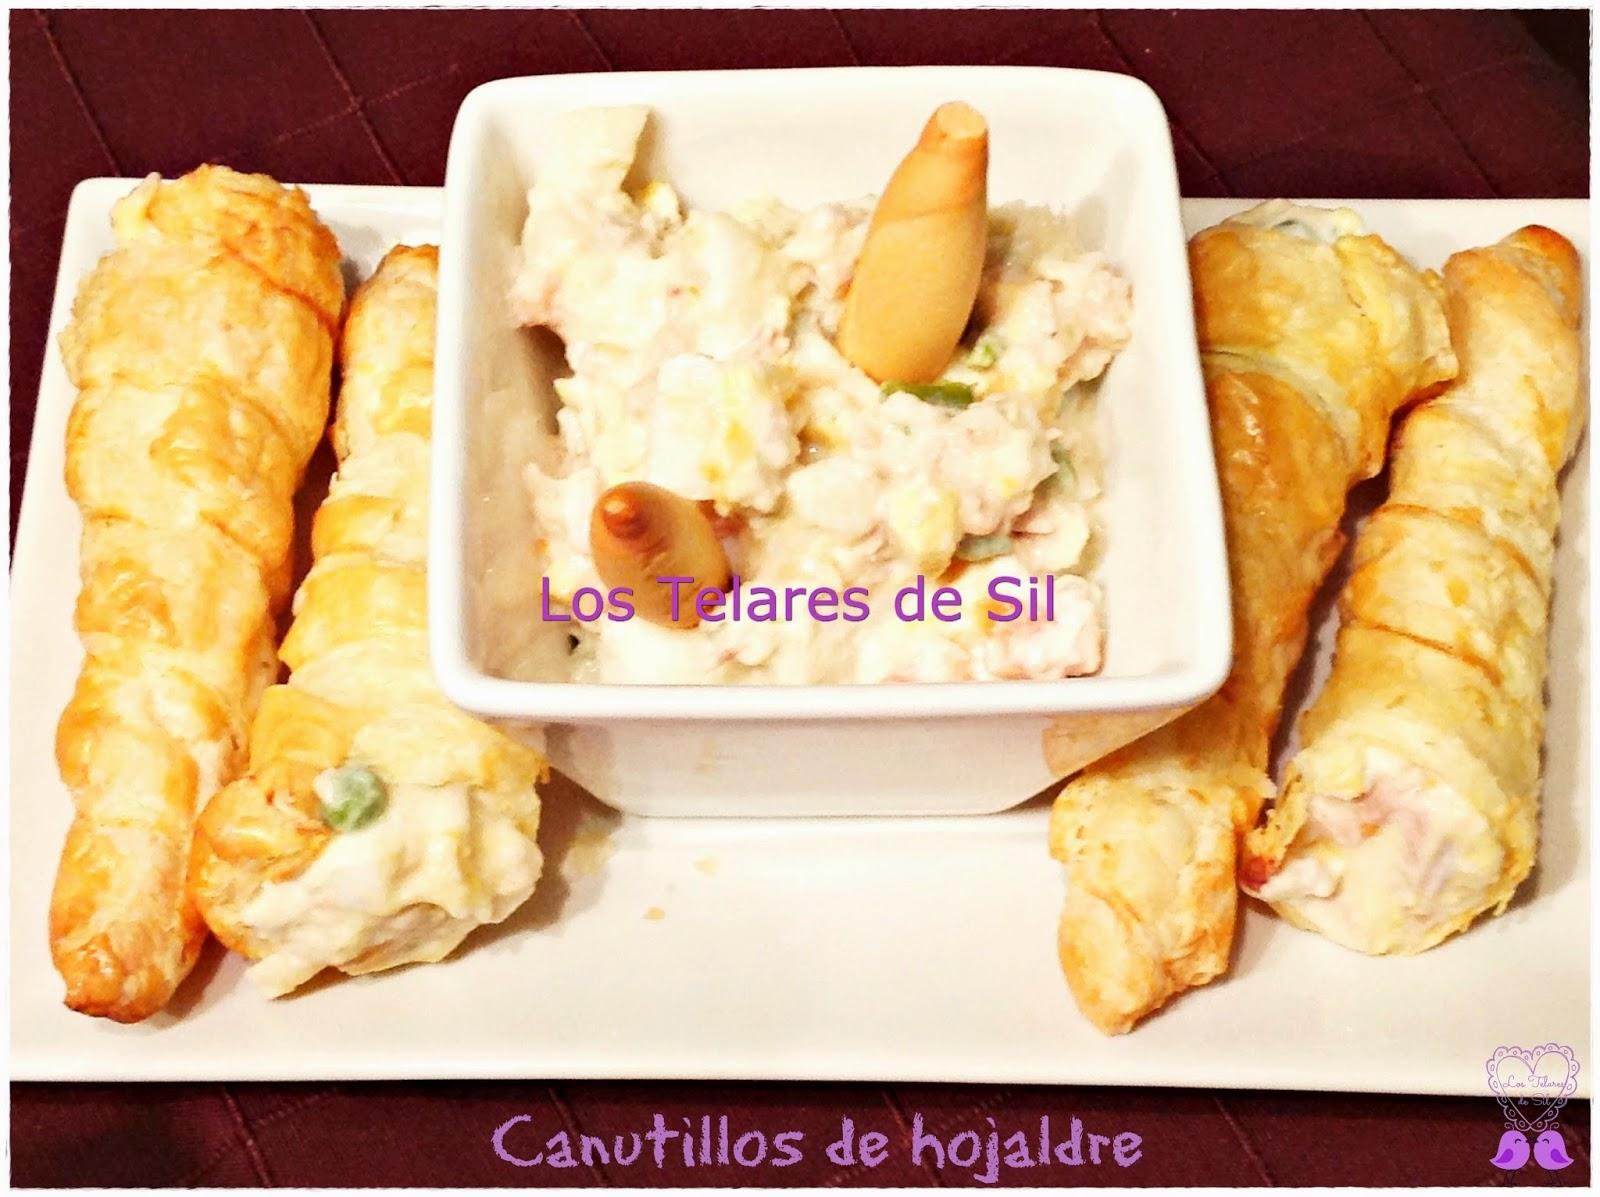 CANUTILLOS DE HOJALDRE